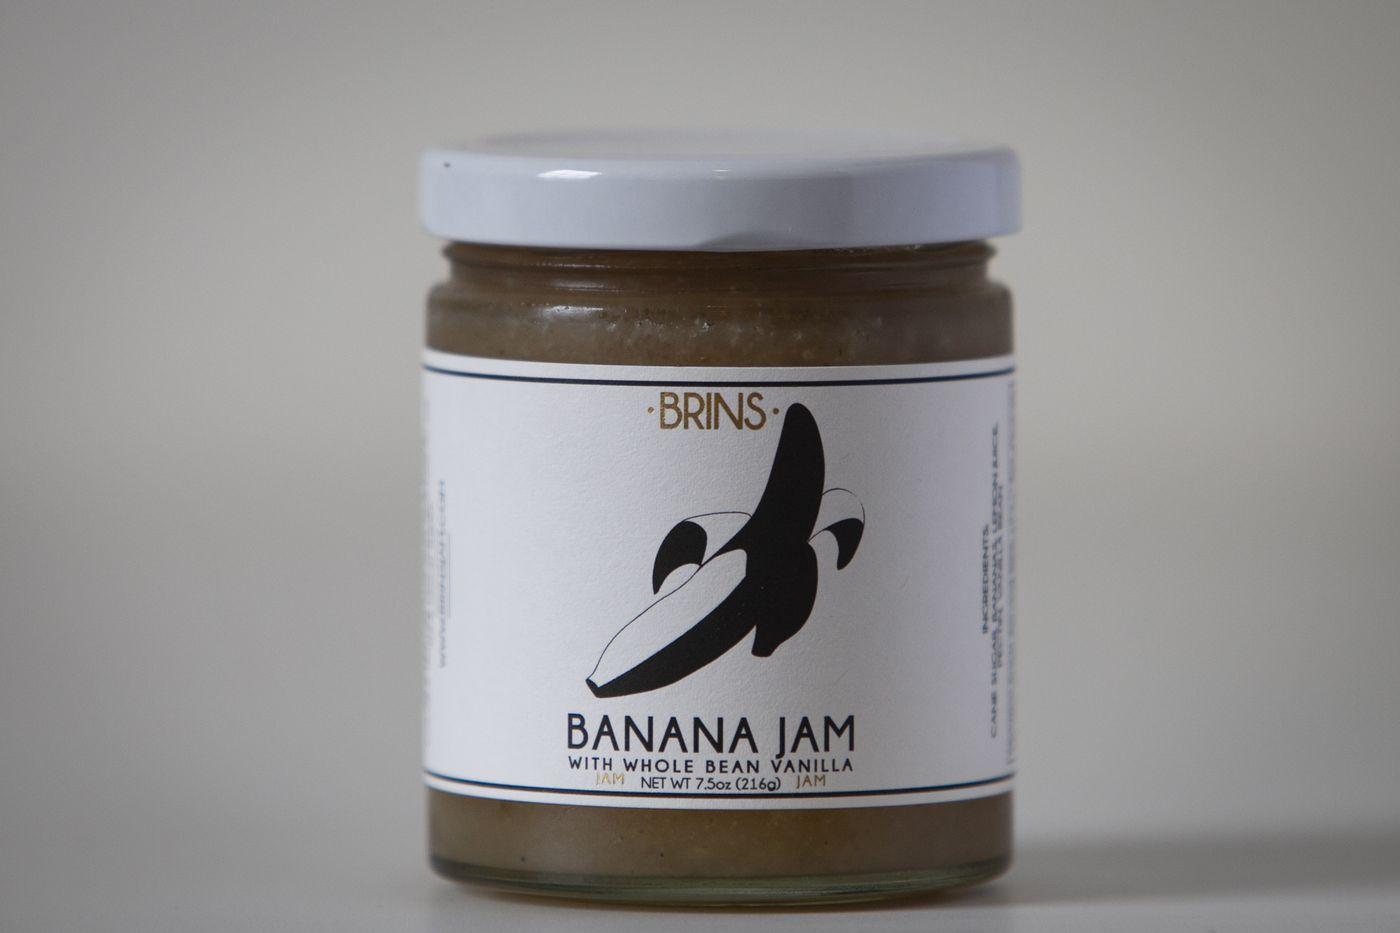 Try a peanut butter and banana jam sandwich